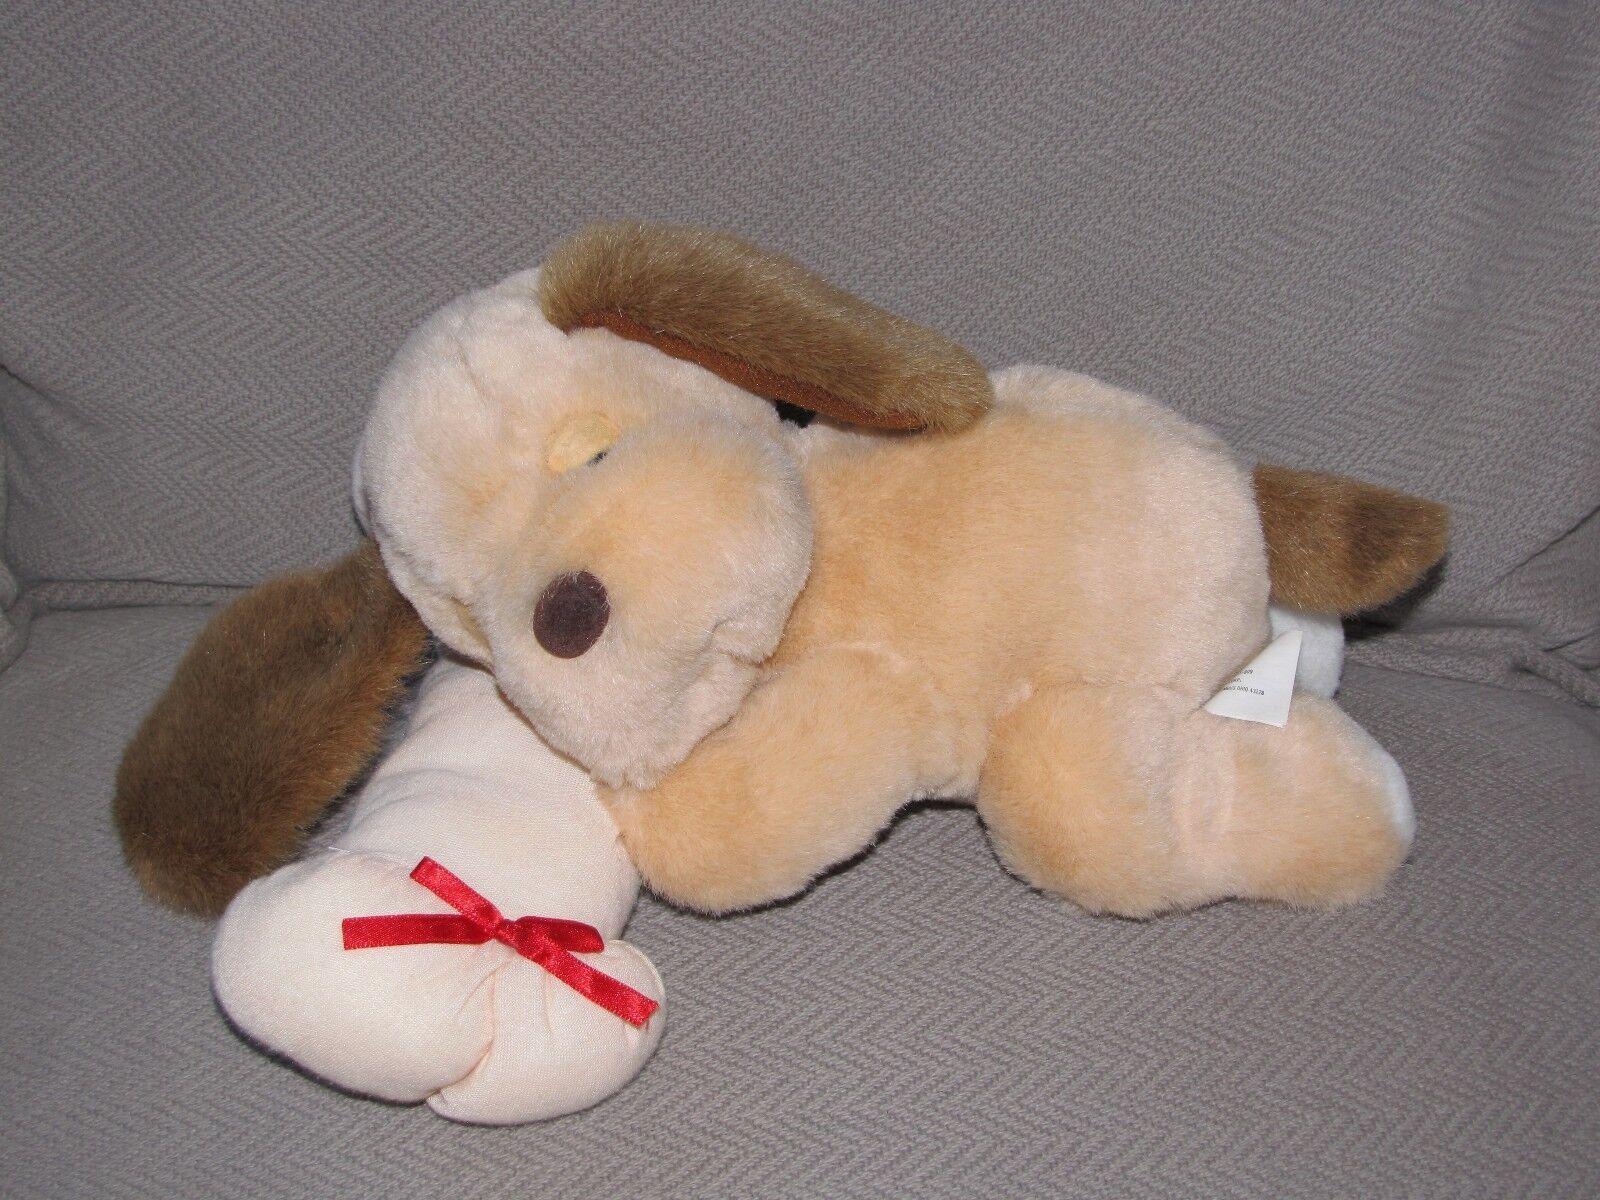 GREAT AMERICAN FUN CORP GAF STUFFED PLUSH PUPPY DOG braun BEIGE TAN SNORE BONE